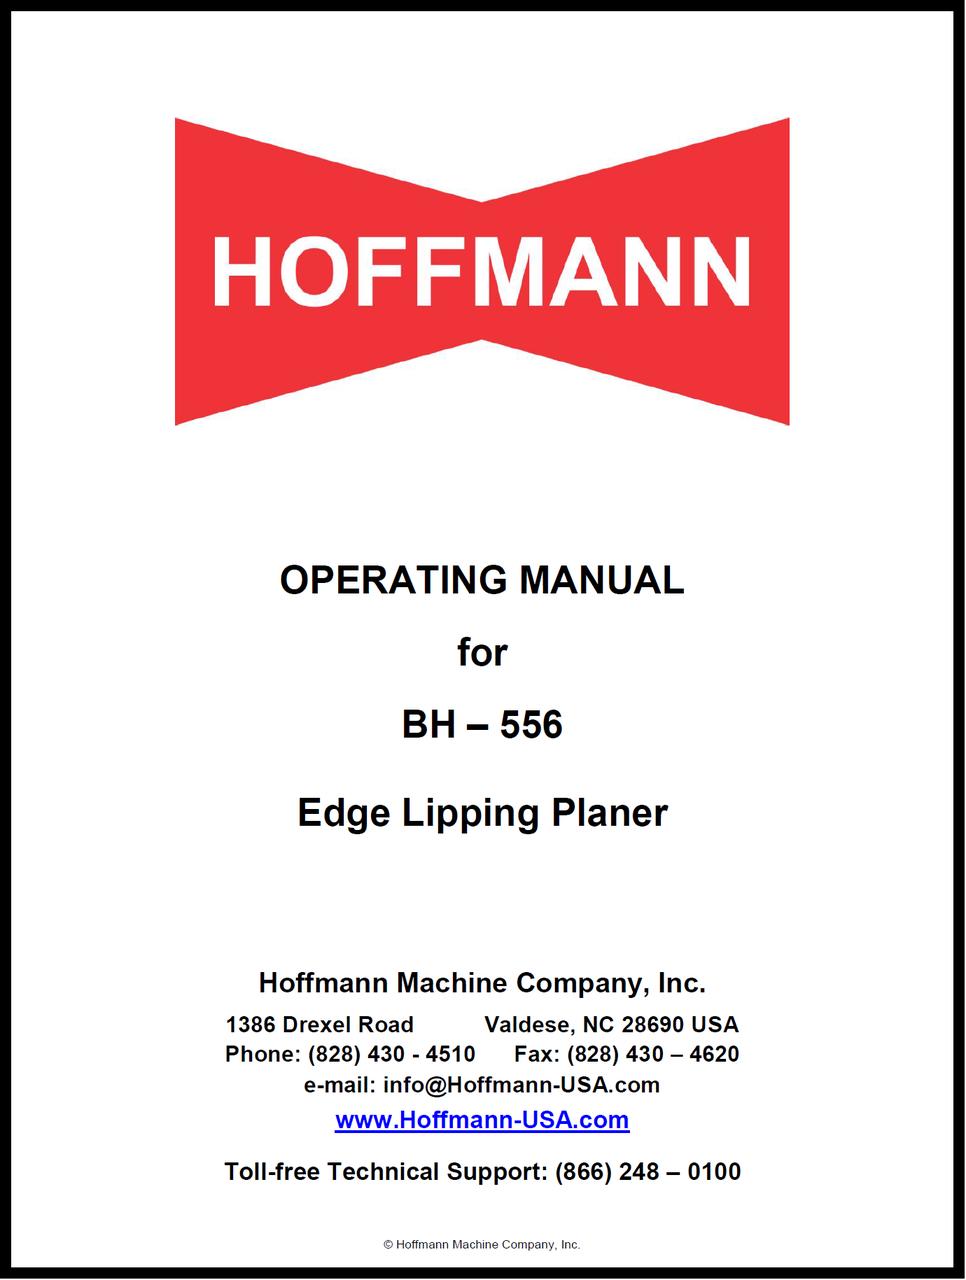 Hoffmann BH-556 Edge Lipping Planer Operating Manual